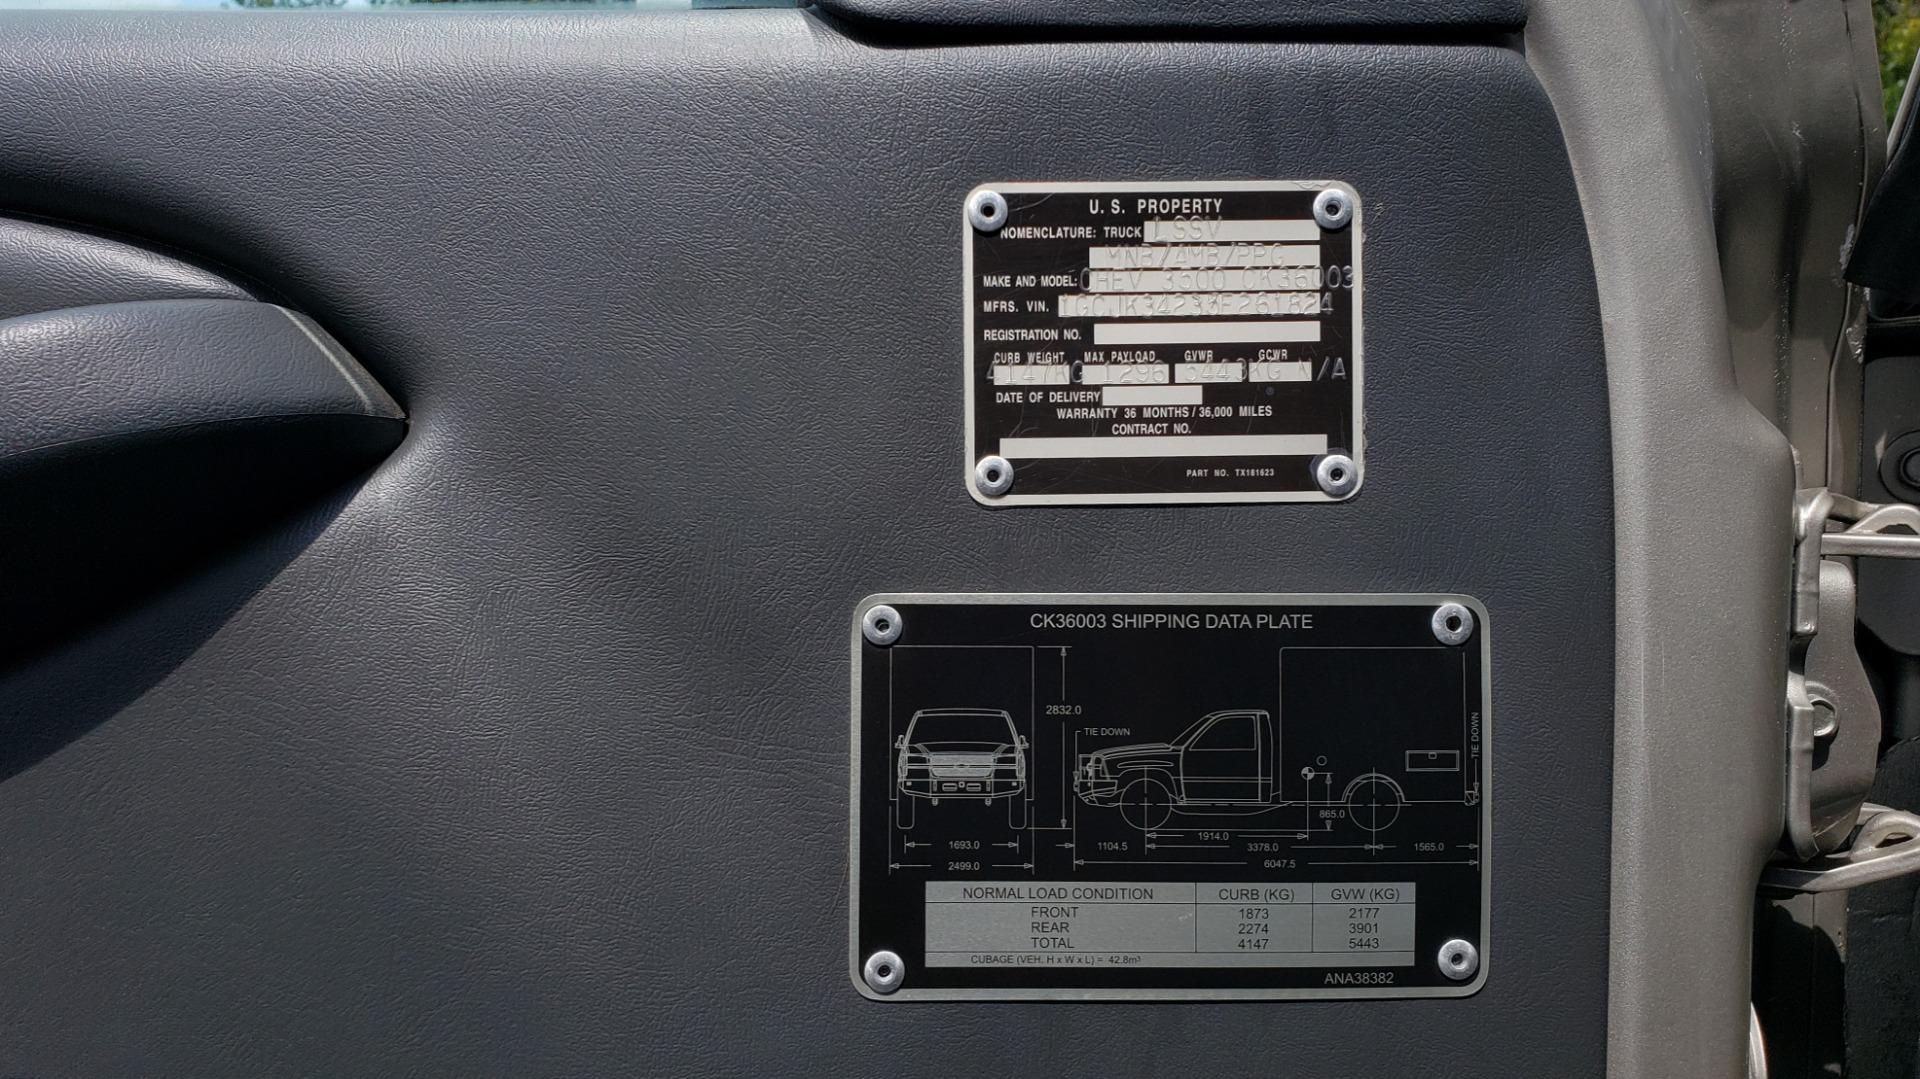 Used 2005 Chevrolet SILVERADO 3500 DRW / 4WD / REG CAB / 6.6L DURAMAX / DOOMSDAY PREPPER for sale $21,595 at Formula Imports in Charlotte NC 28227 31